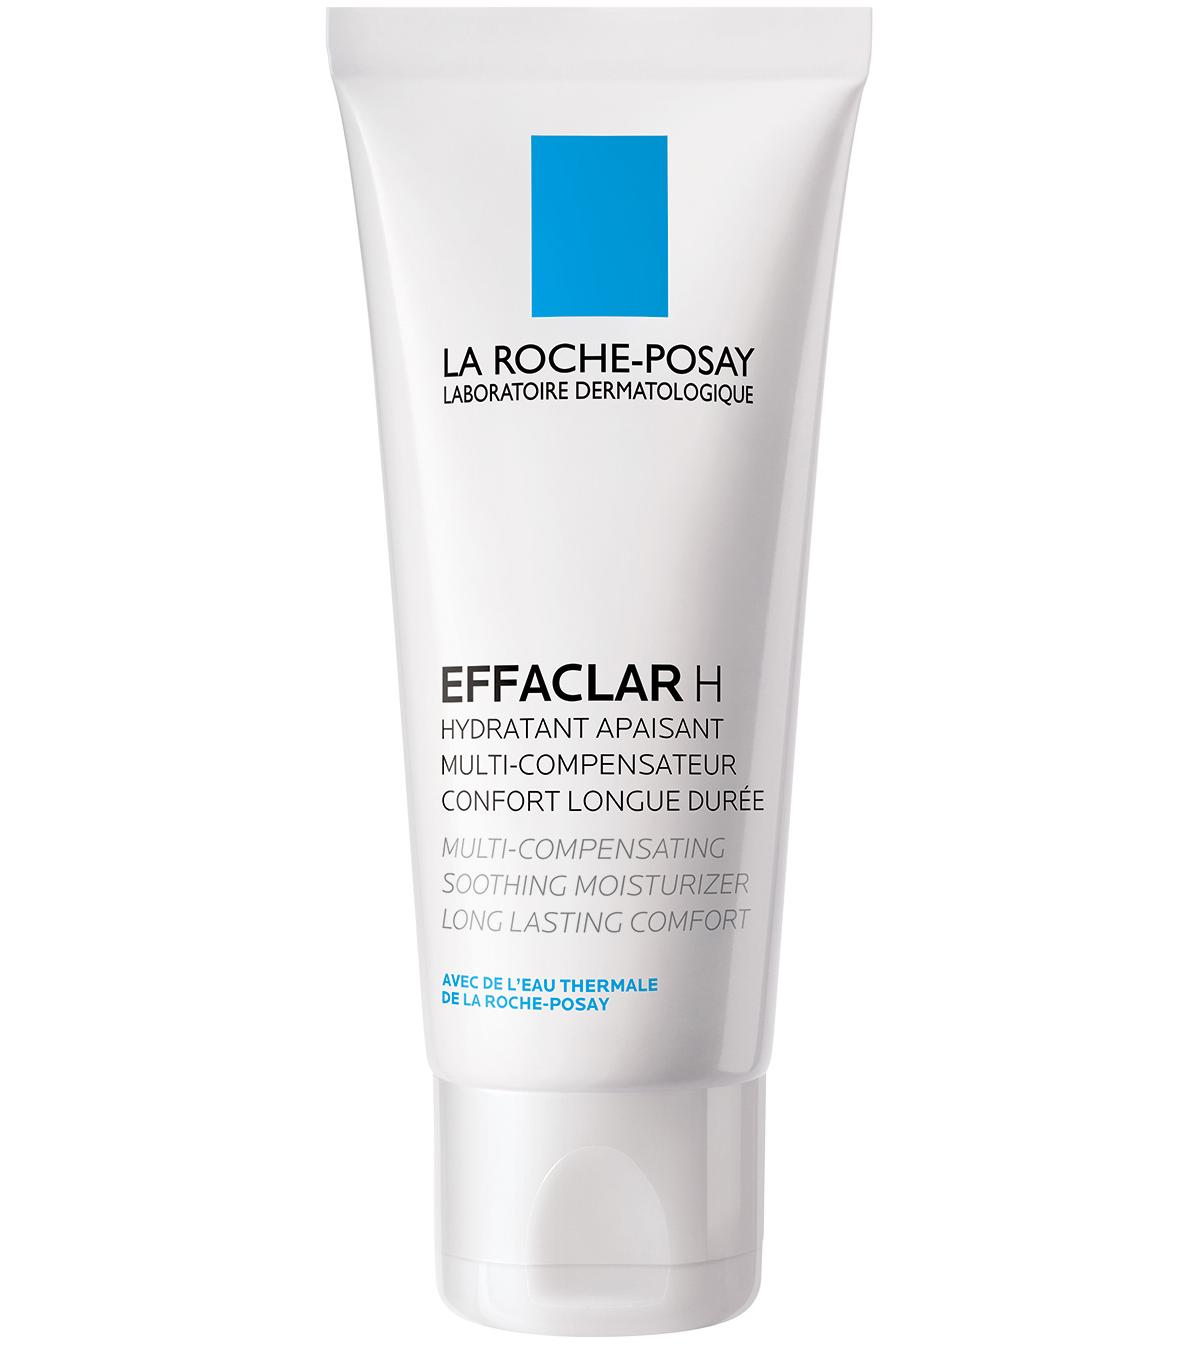 La Roche-Posay EffaclarH Καταπραϋντική Ενυδατική Κρέμα 40ml